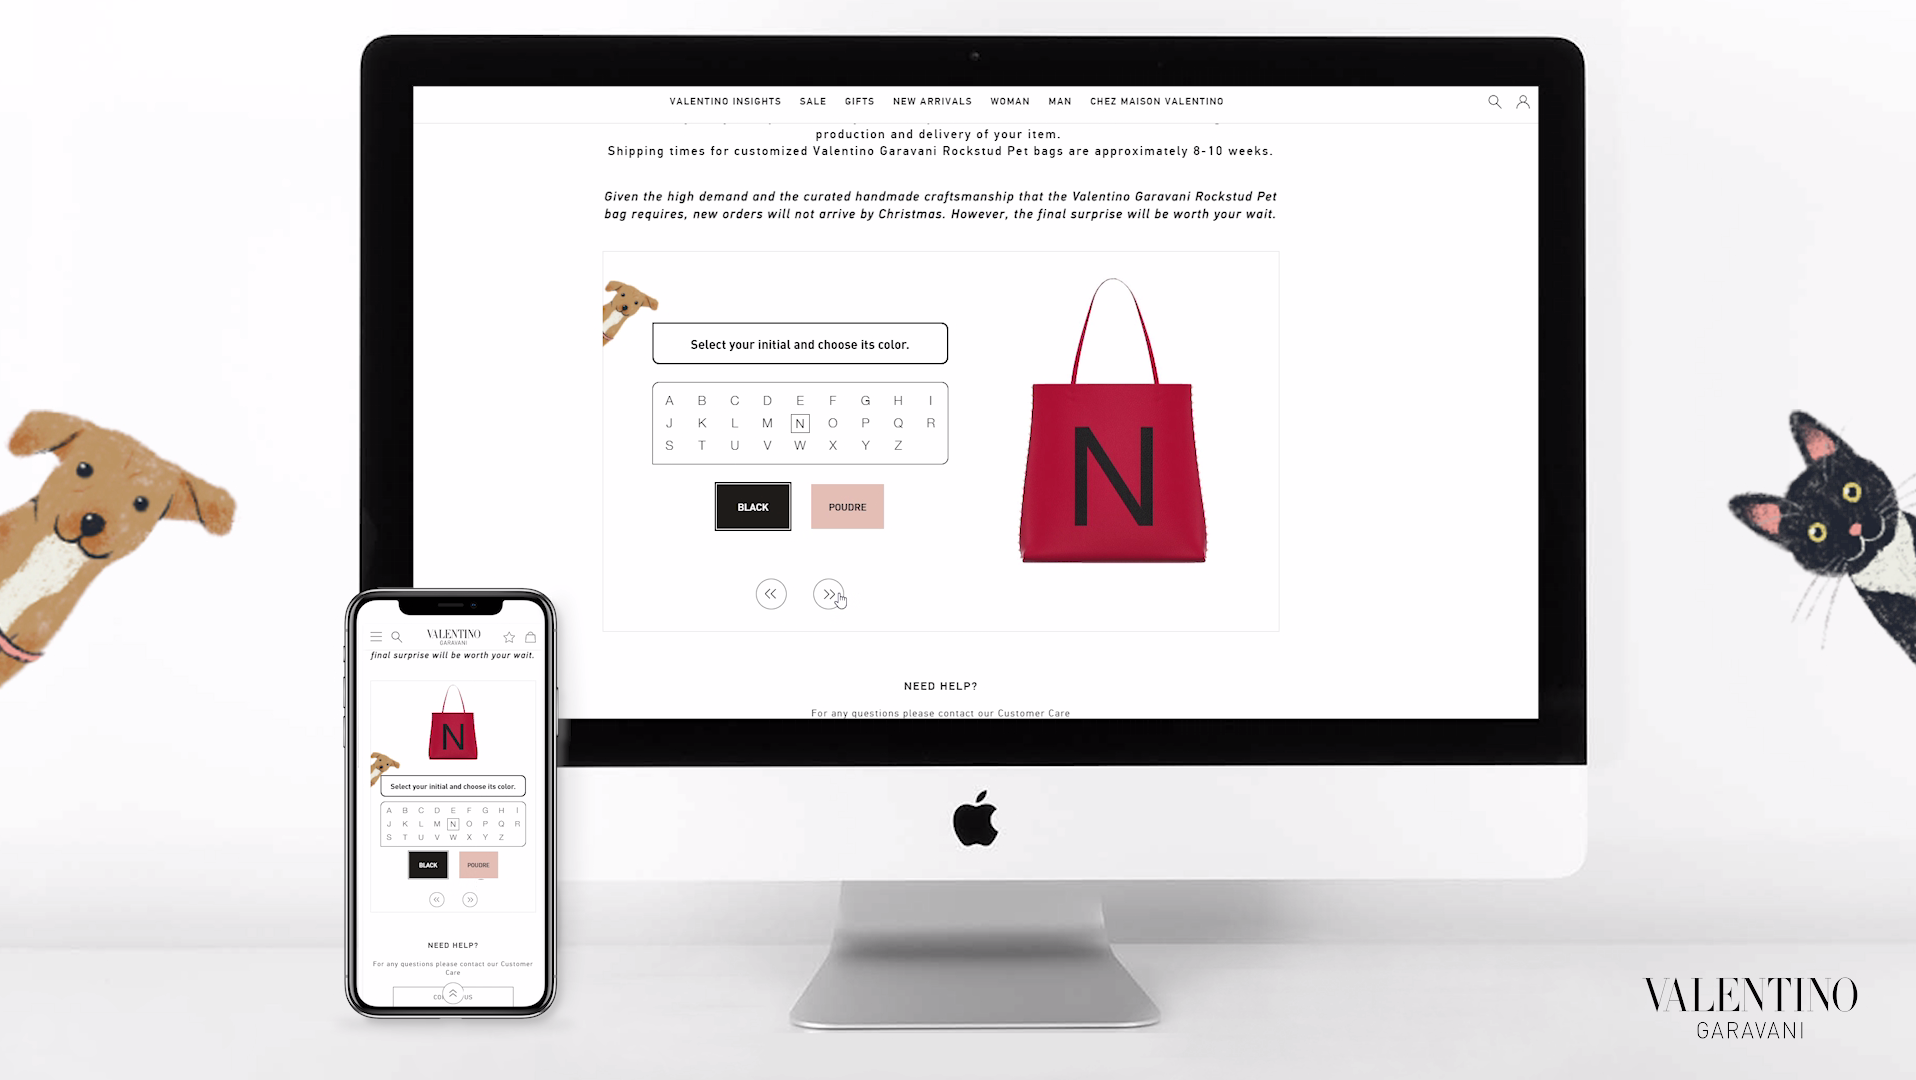 3d configurator for bags, Valentino Rockstud pet customization experience